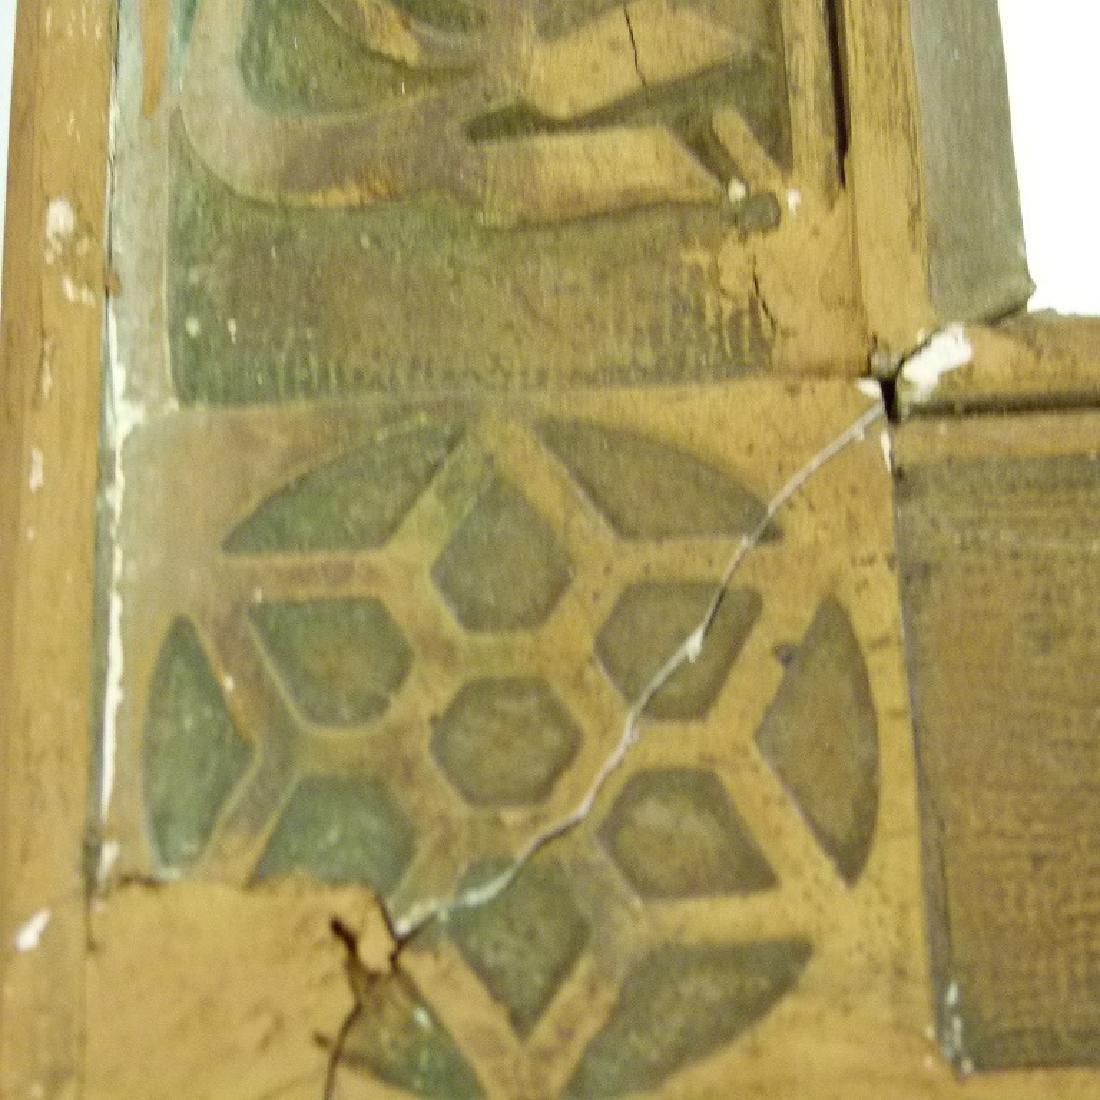 PERSIAN GILT FRAME W/ MIRROR, 19TH C. - 4